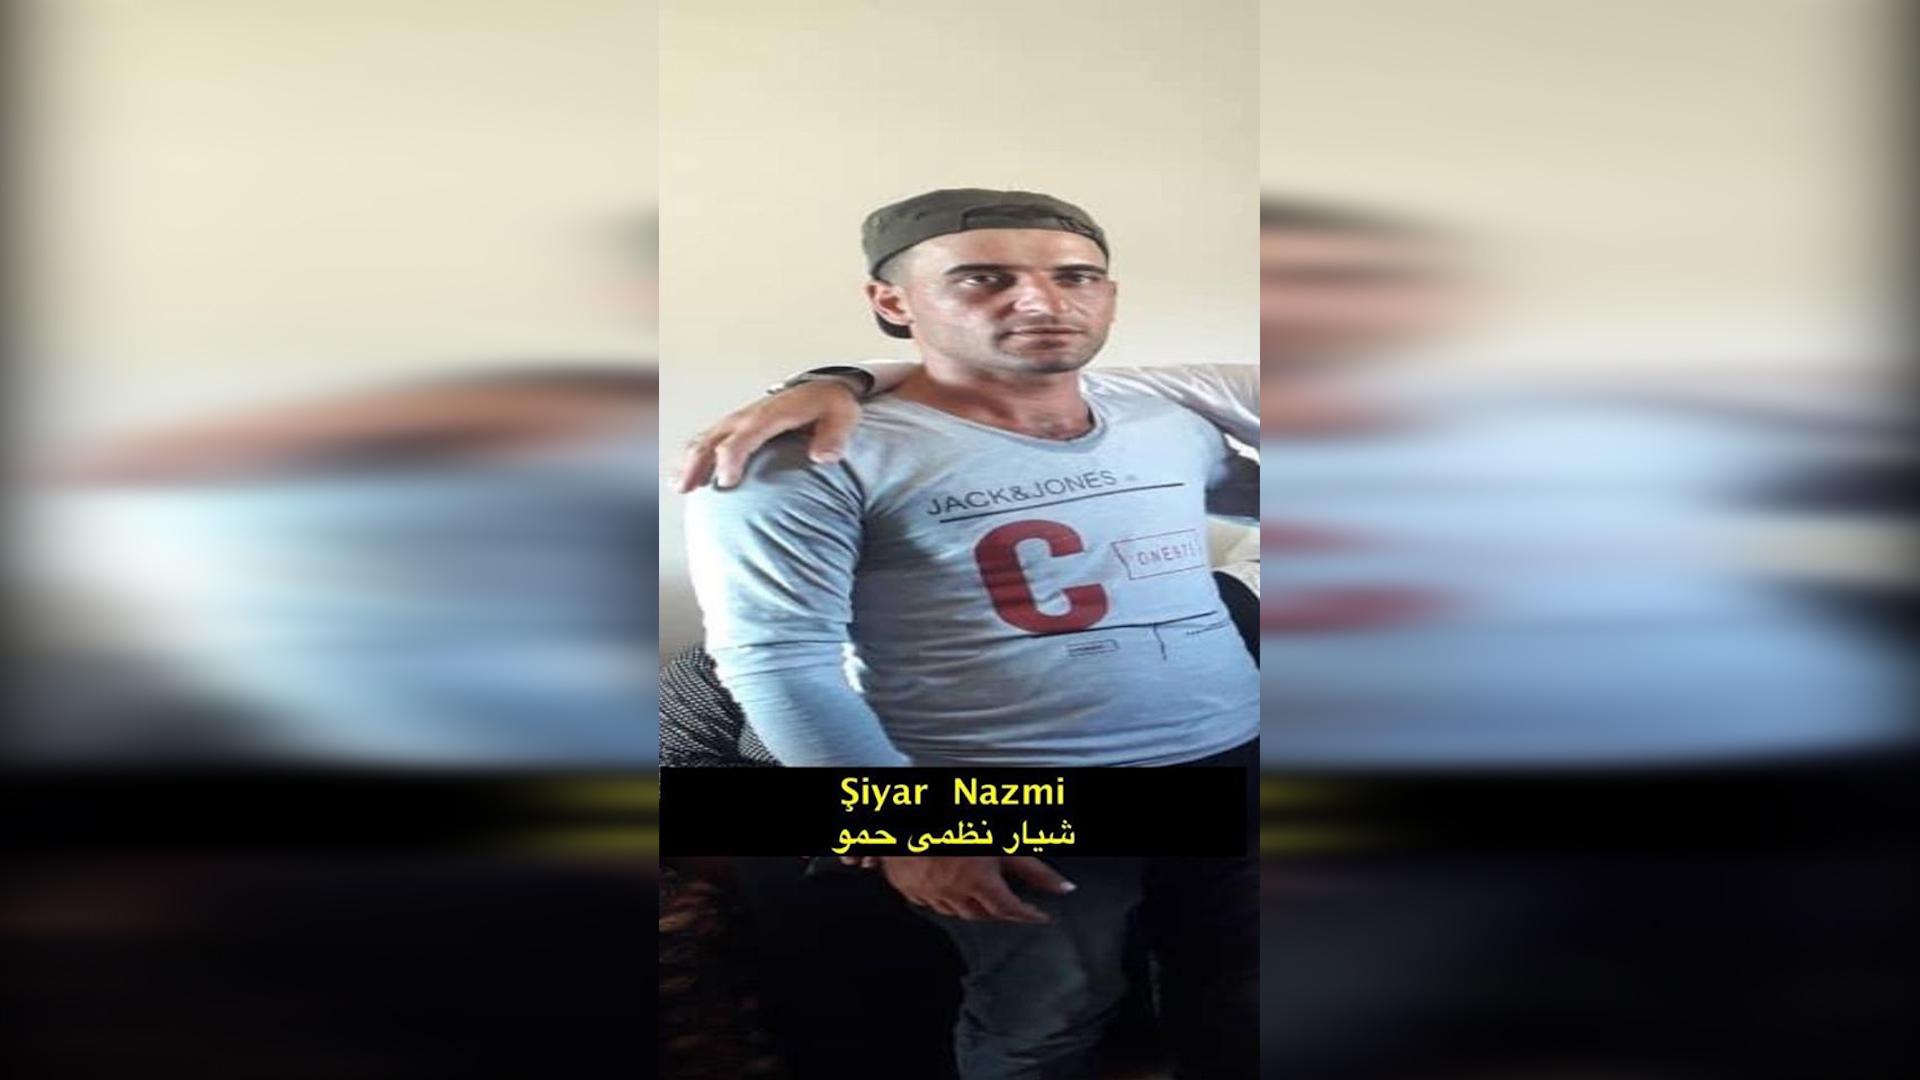 Photo of عفرين.. اختطاف شاب من قرية غزاوية بشيراوا ومطالبة ذويه بـ 10 آلاف دولار للإفراج عنه